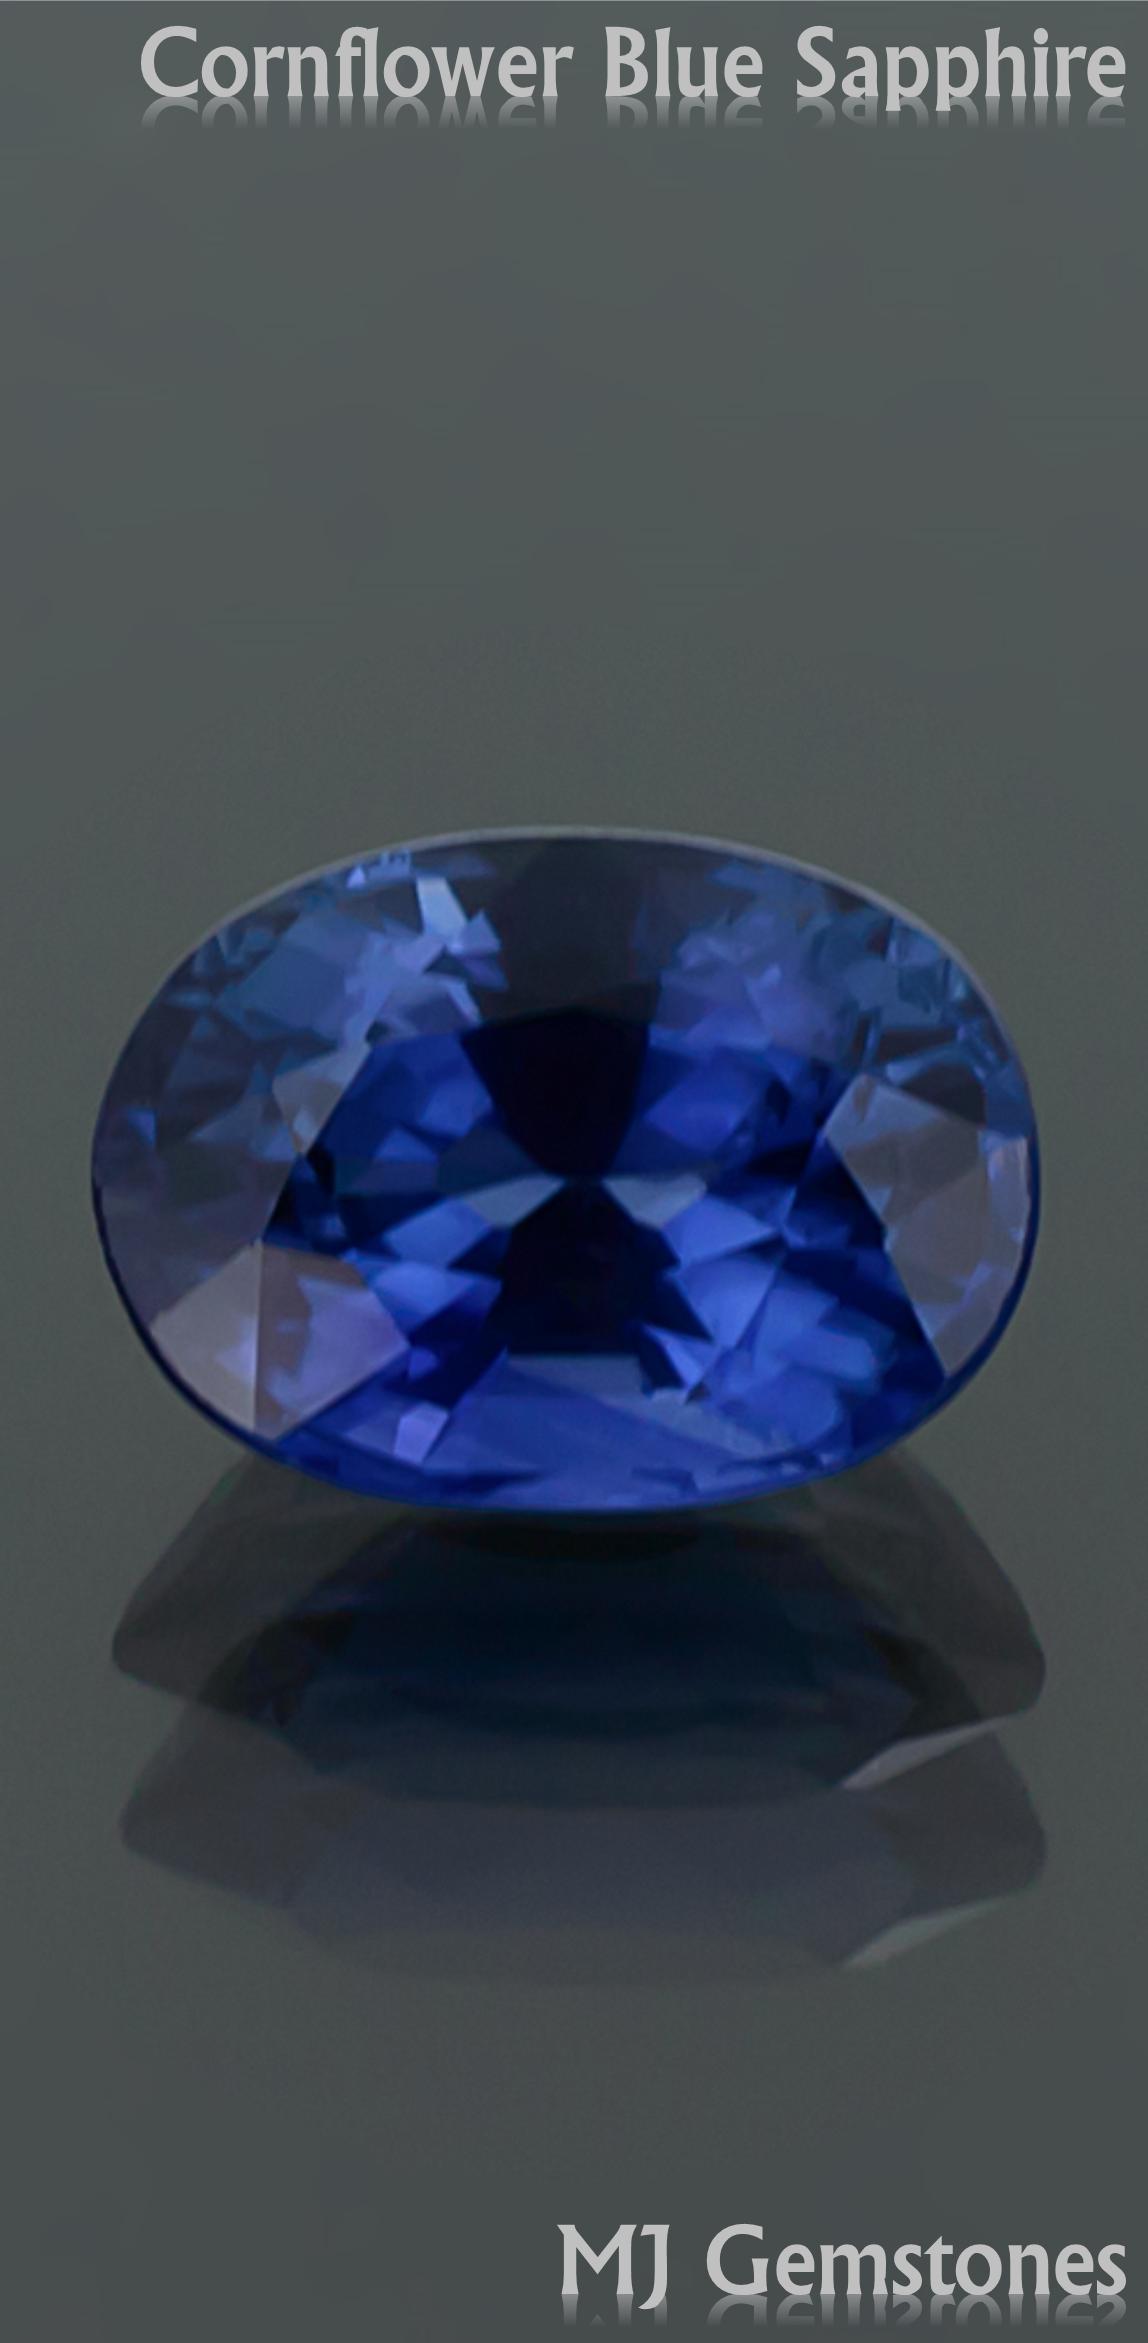 Oval Sapphire Gemstones Blue Sapphire Cornflower Blue